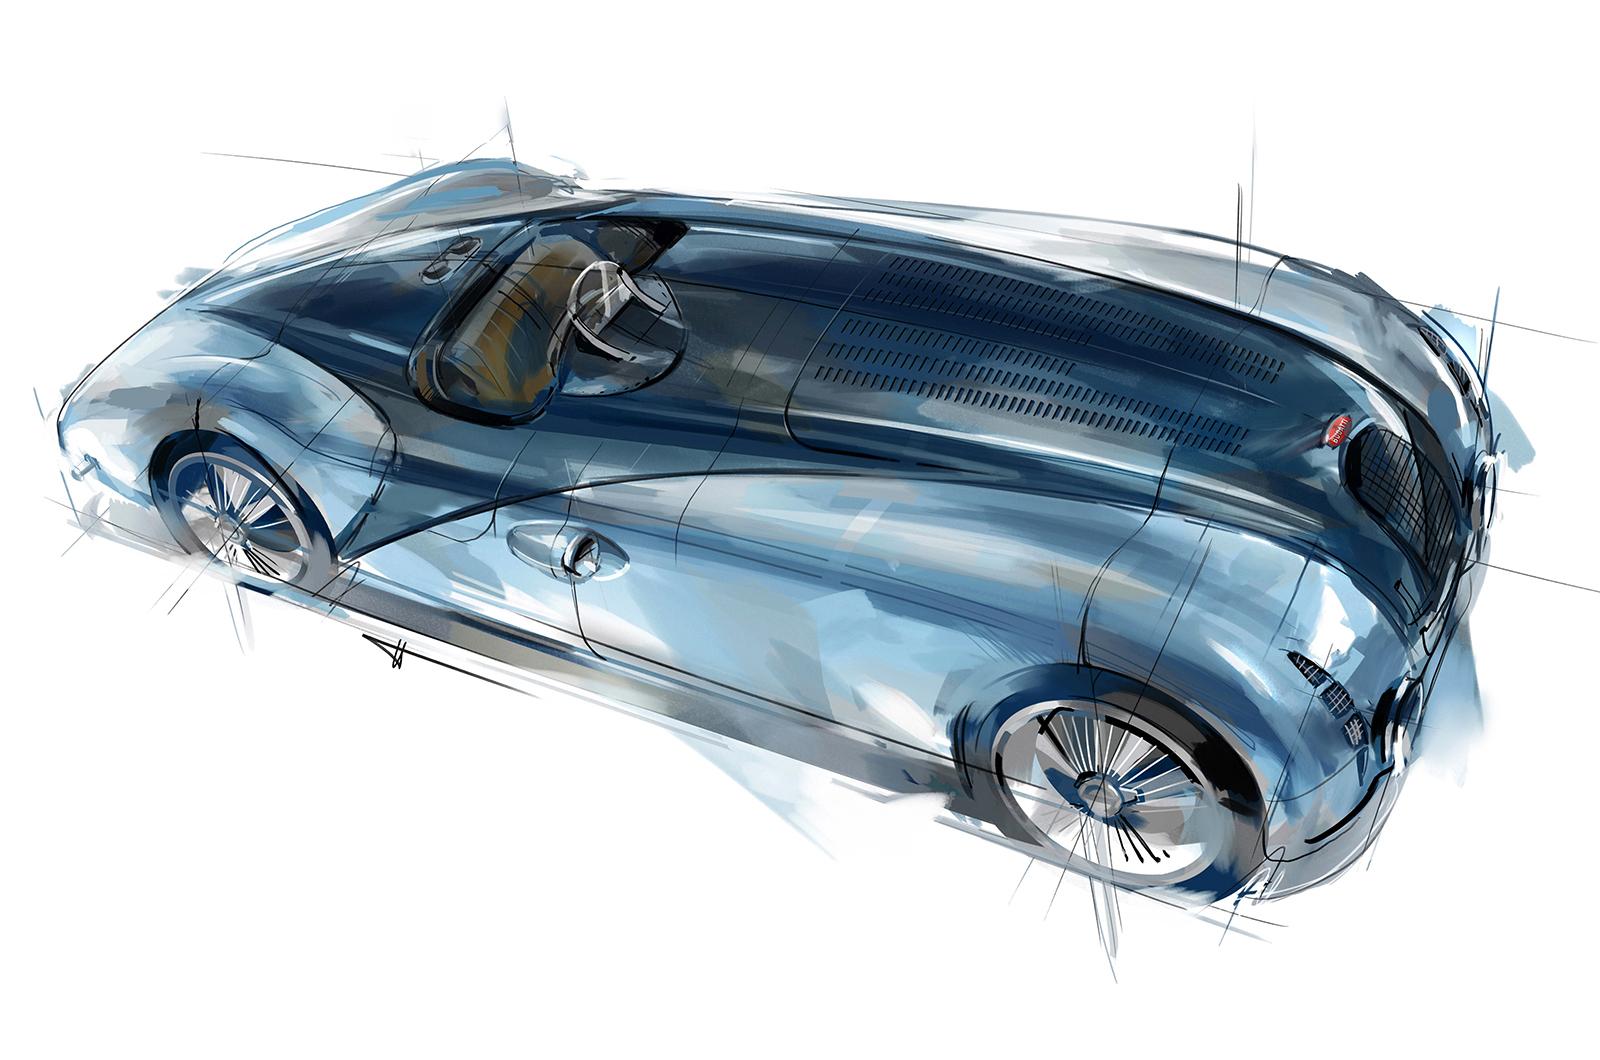 imagini noi edi ii speciale bugatti veyron legends prima i este dedicat. Black Bedroom Furniture Sets. Home Design Ideas